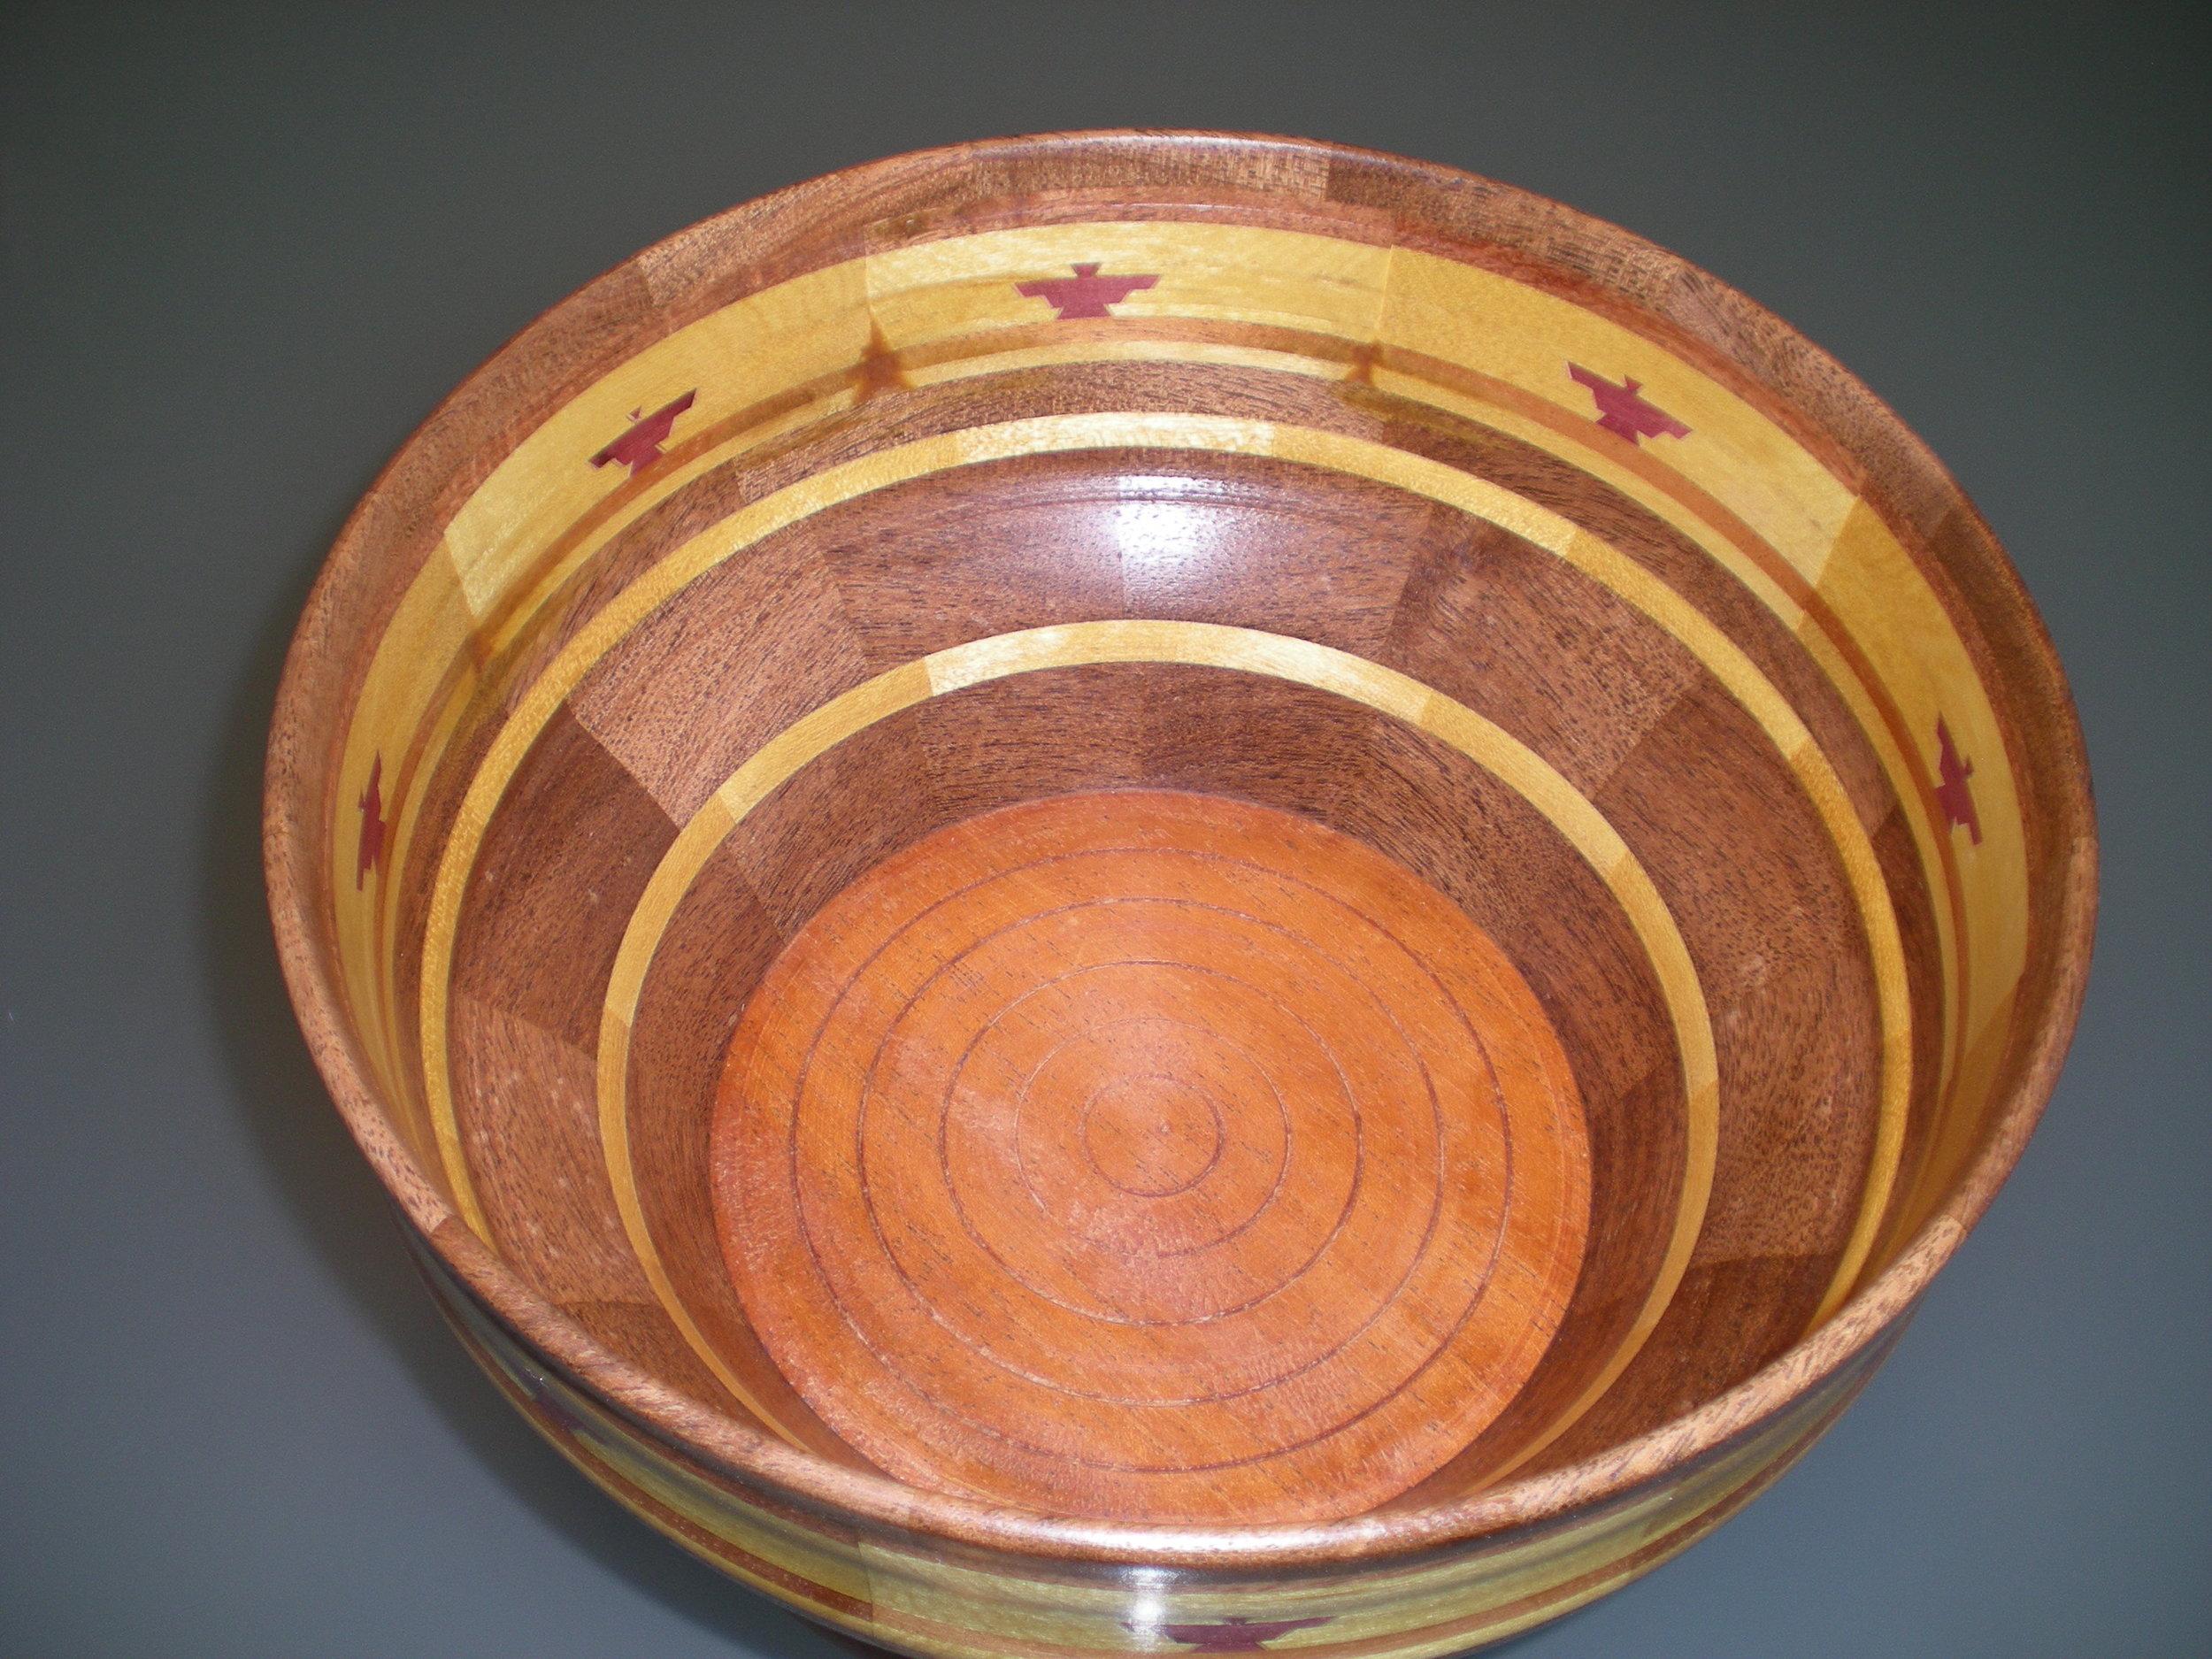 RJC Wood Creations - Bowls (34).JPG